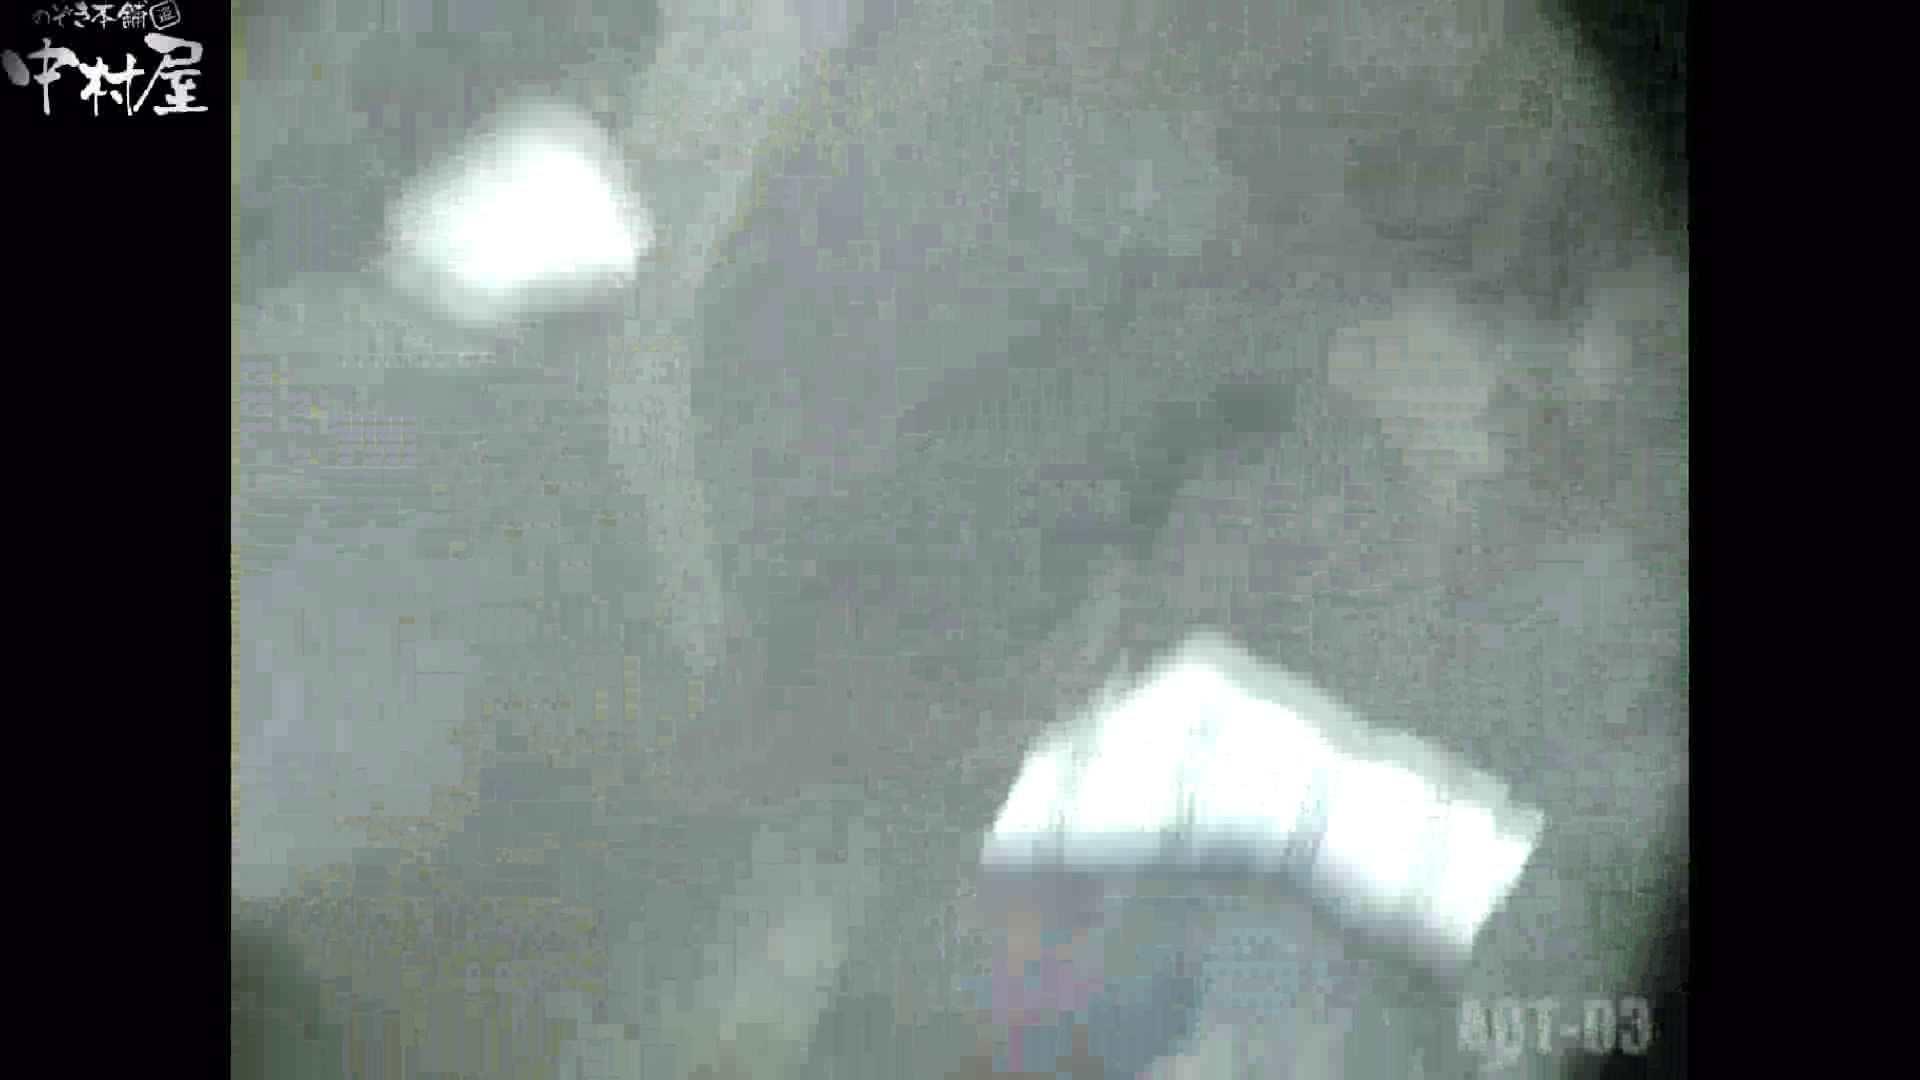 Aquaな露天風呂Vol.867潜入盗撮露天風呂参判湯 其の四 美しいOLの裸体   潜入突撃  90pic 77